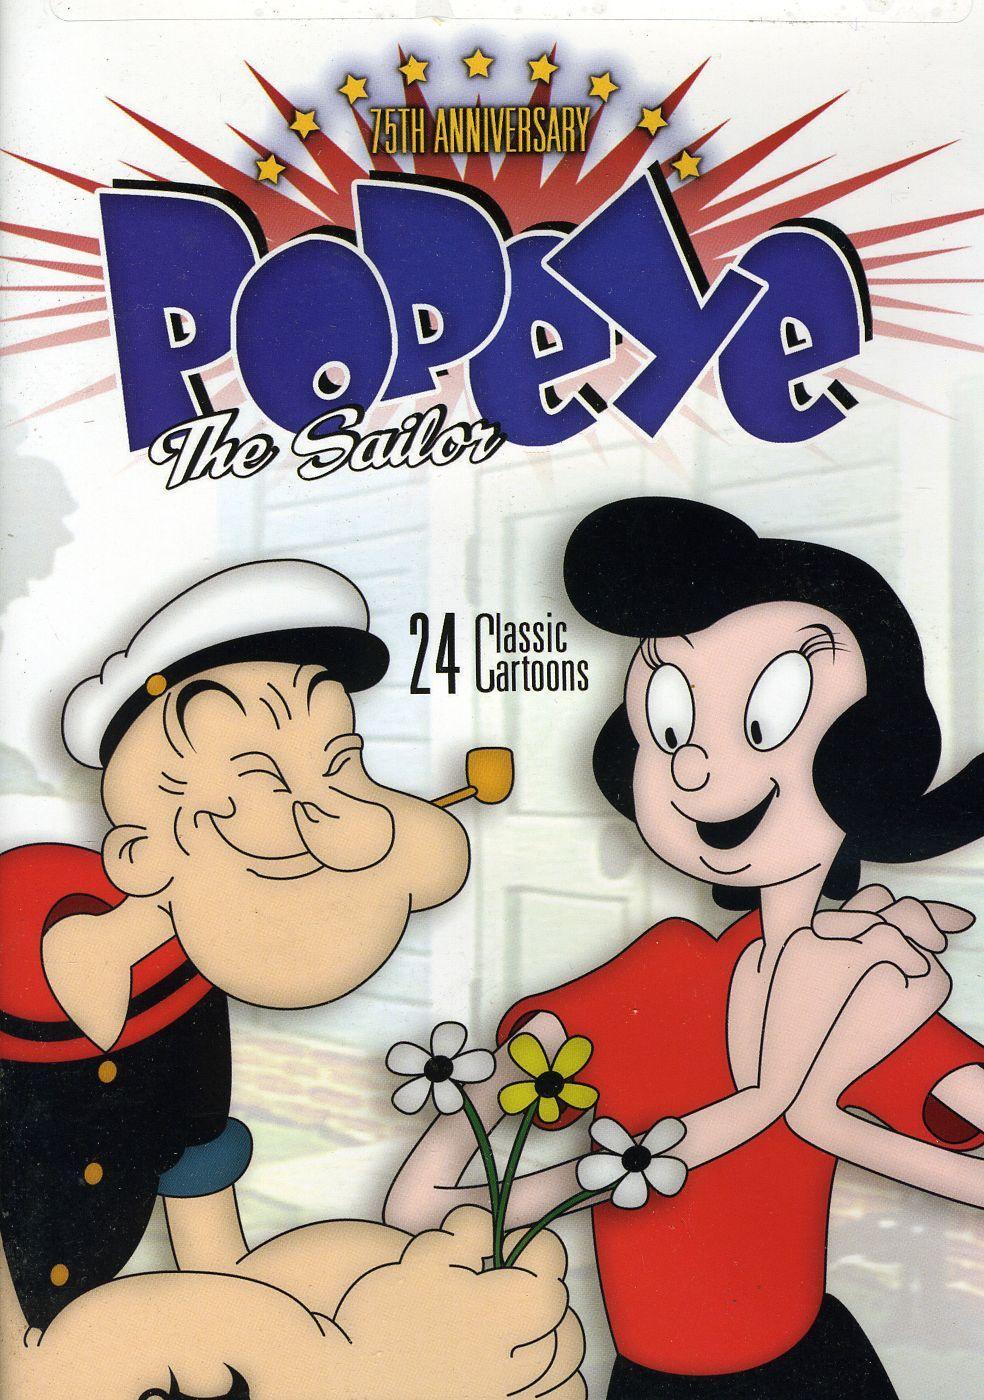 Pics Popeye The Sailor Free For Screensaver Image Wallpaper